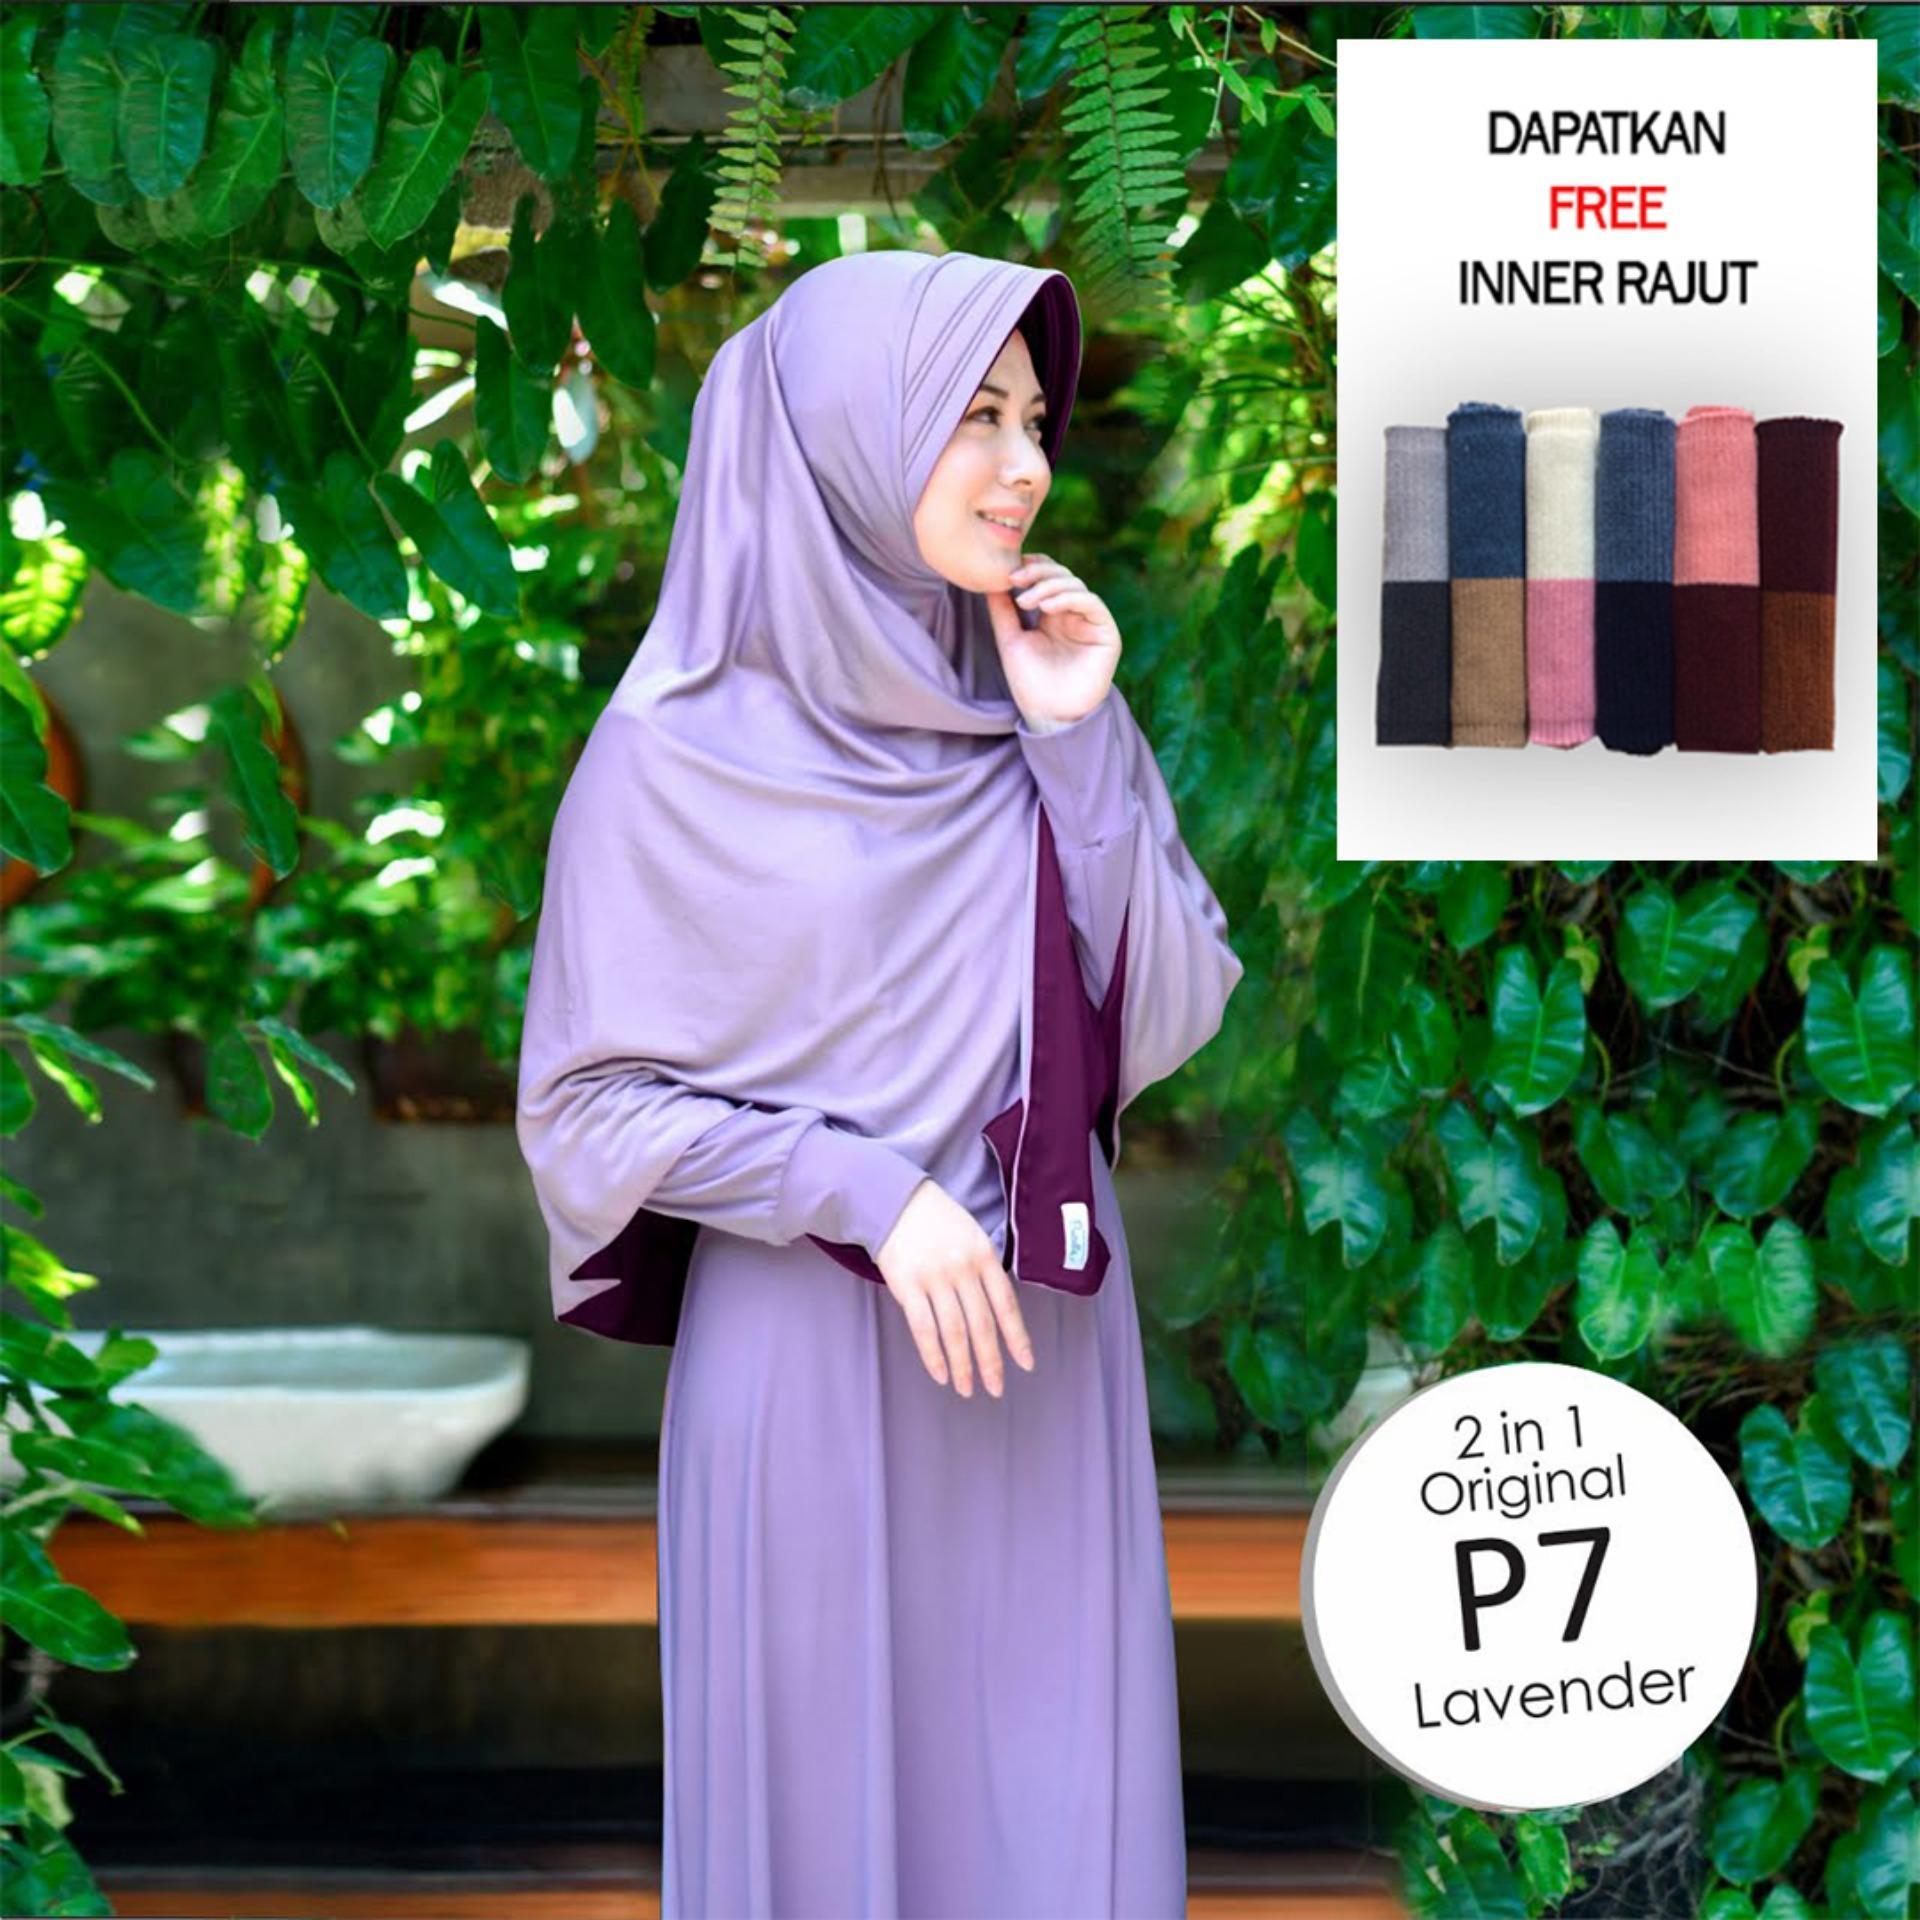 Jilbab 2 Warna / Hijab Instan / Kerudung Langusng Pakai Model Baru / Hijab Bolak Balik Dua Warna / 2 in 1 Original Grade A / Fashion Muslim Wanita Remaja Modern